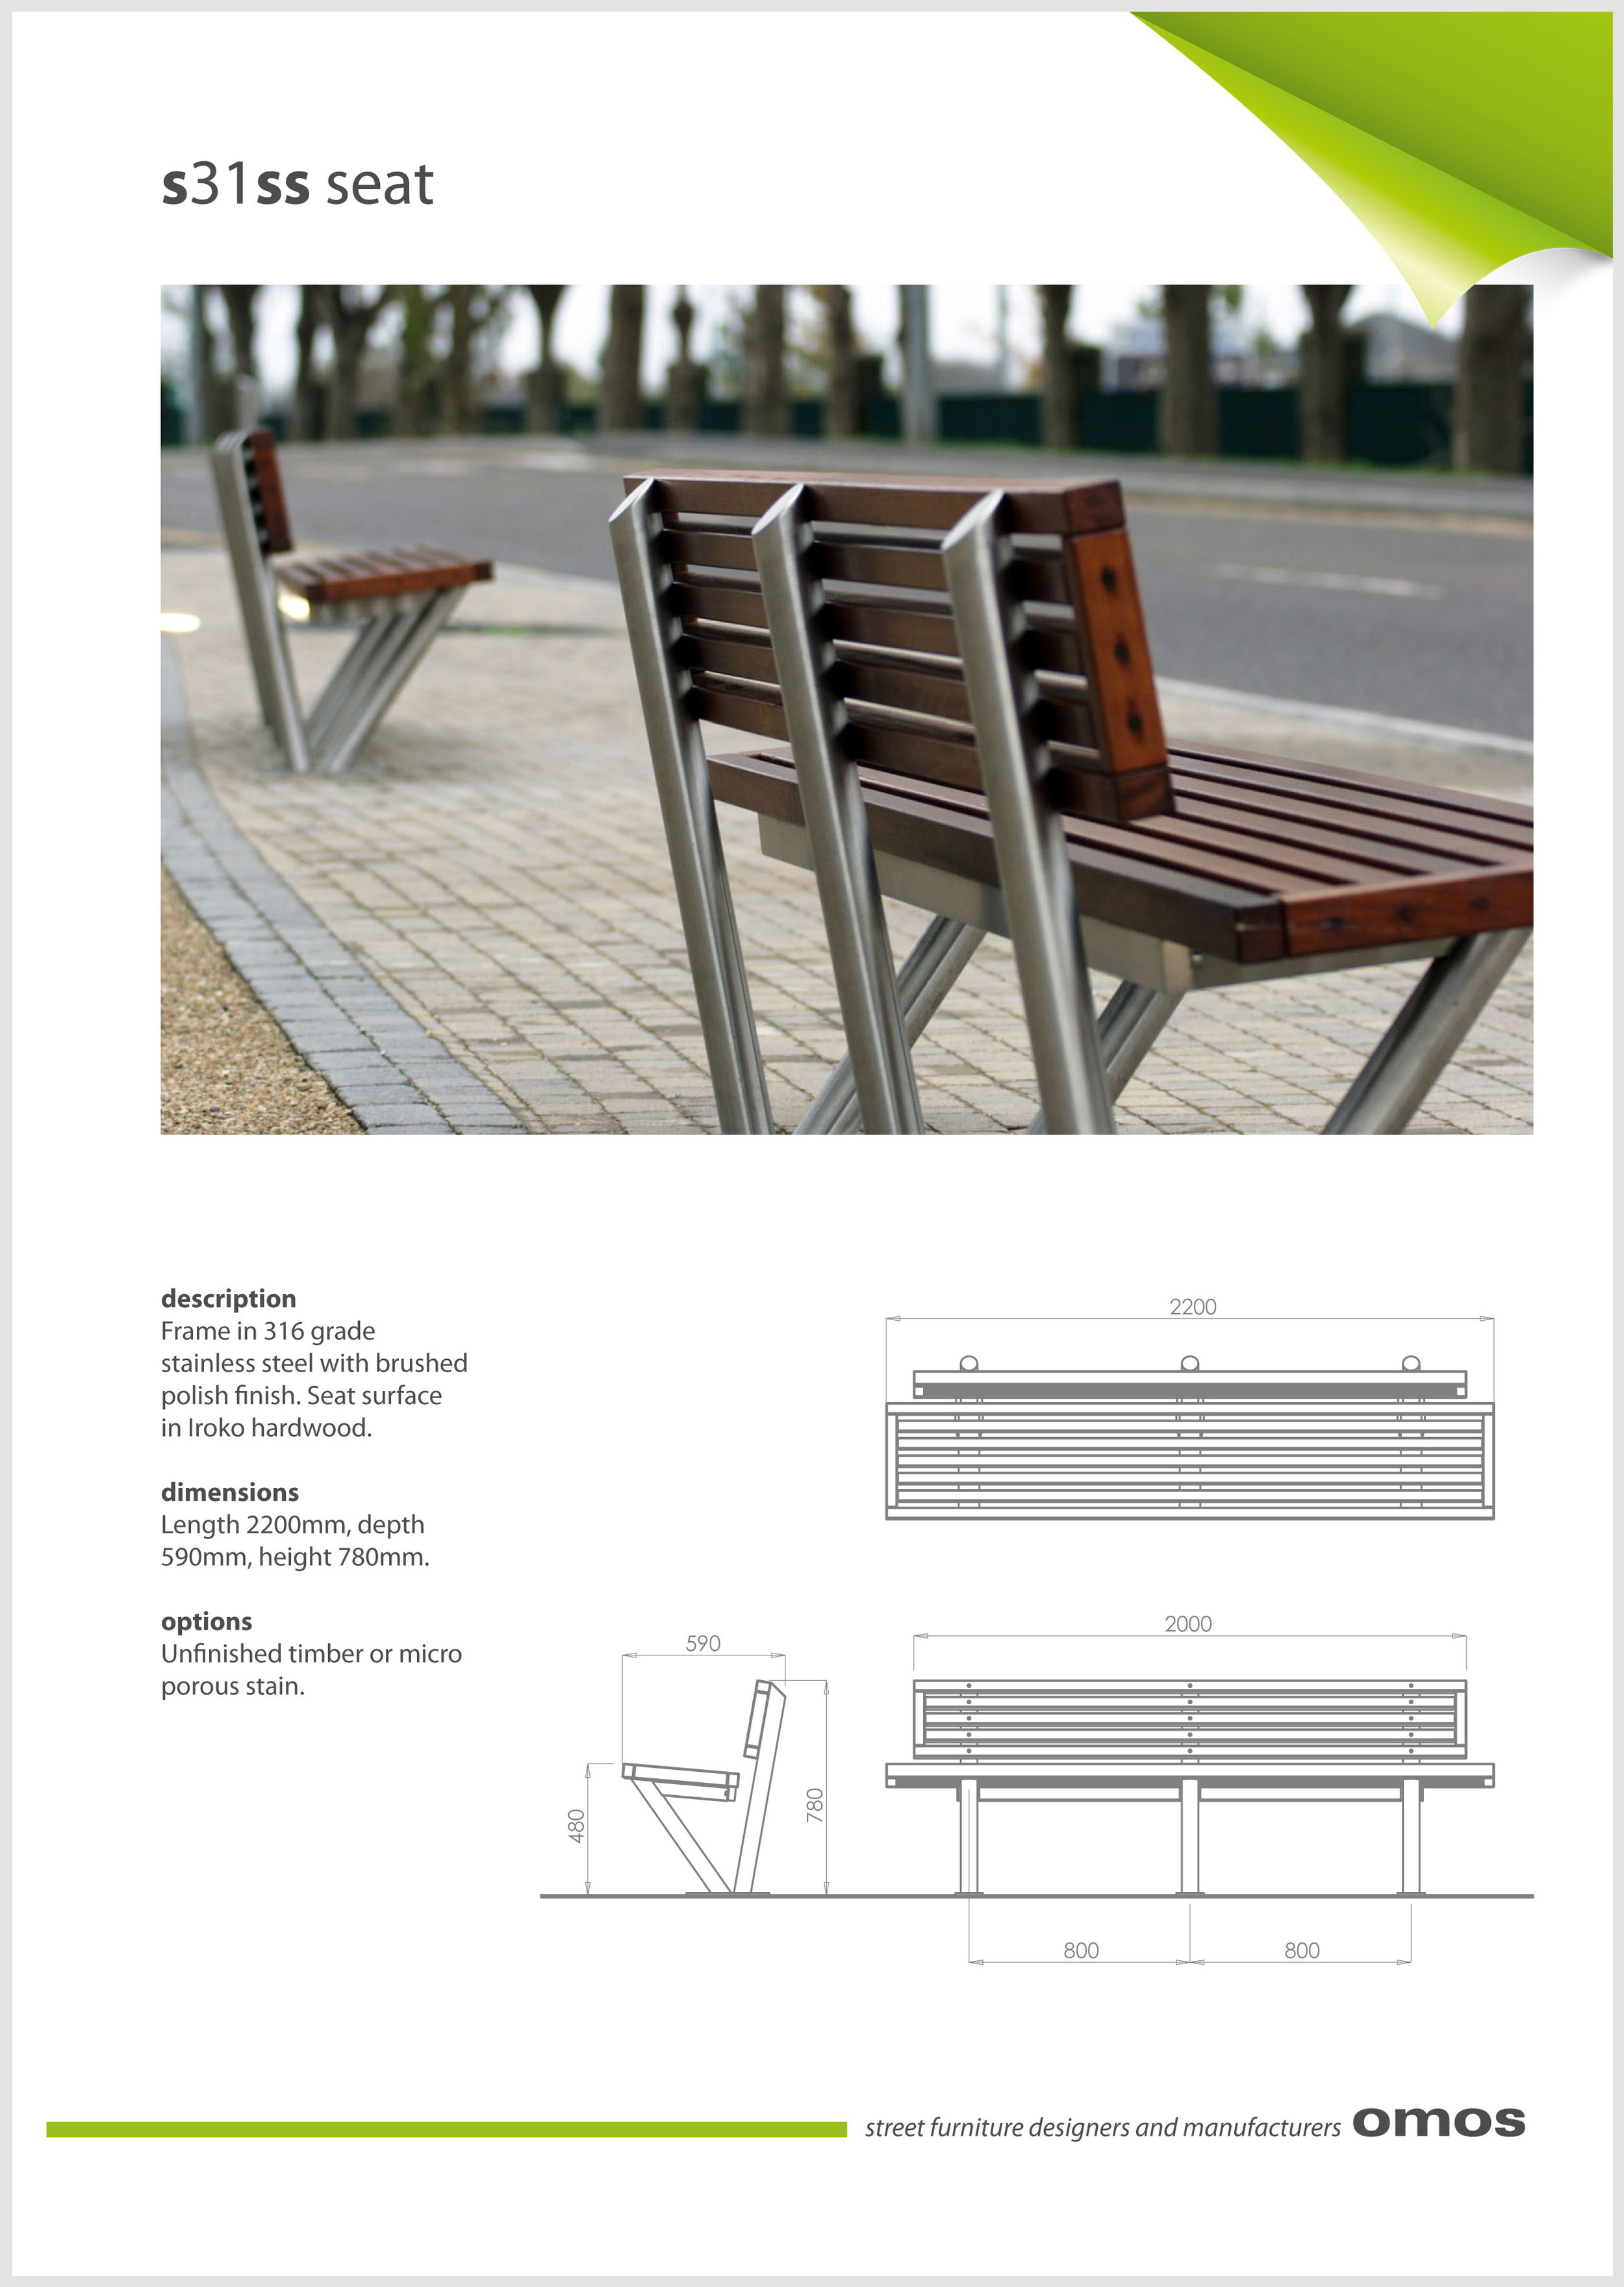 s31ss seat data sheet.jpg